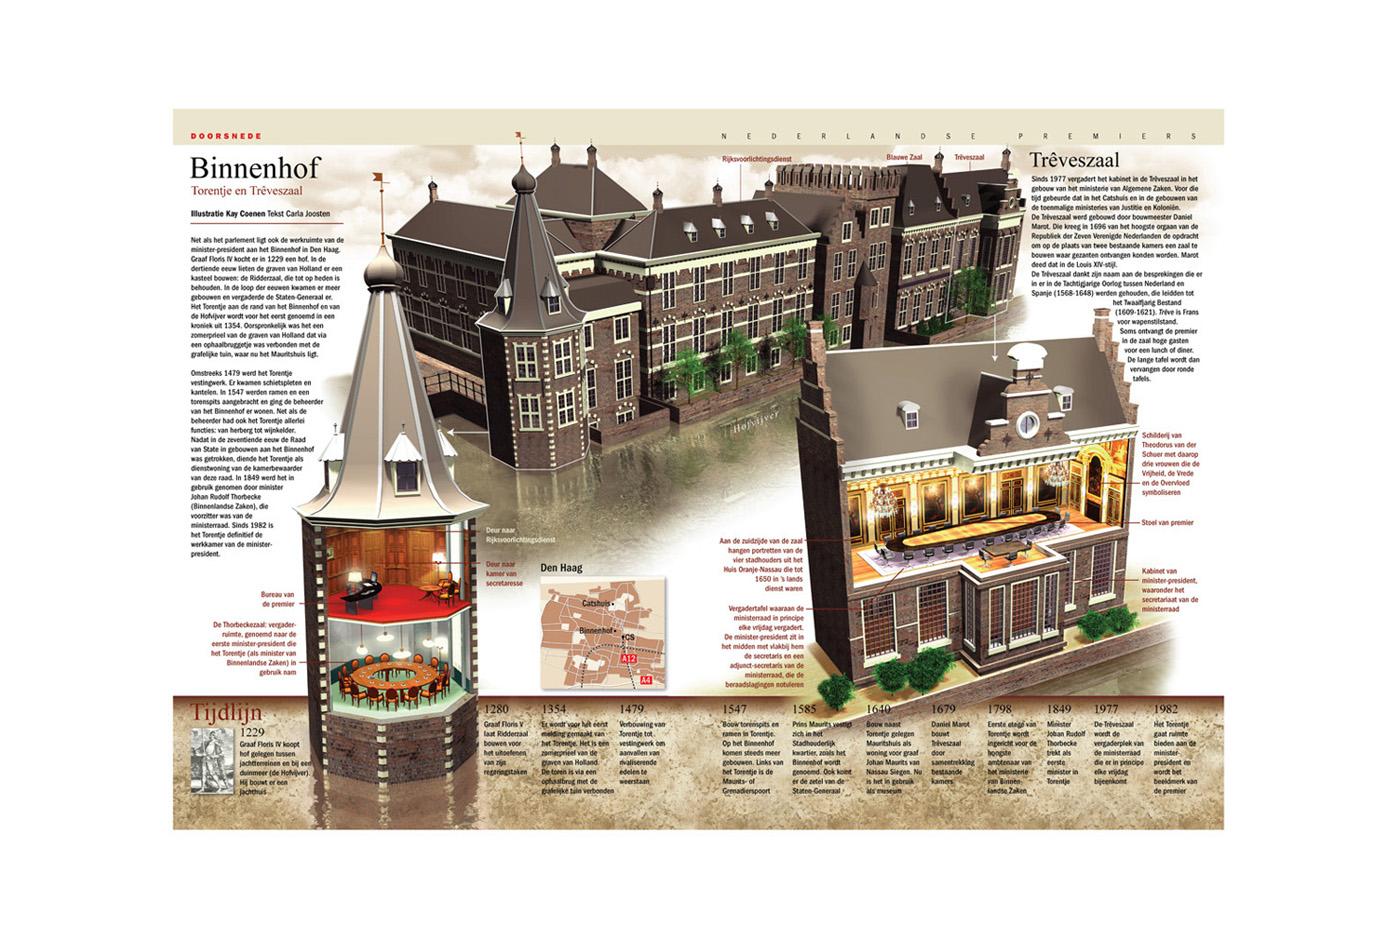 Infographic - Het Binnenhof